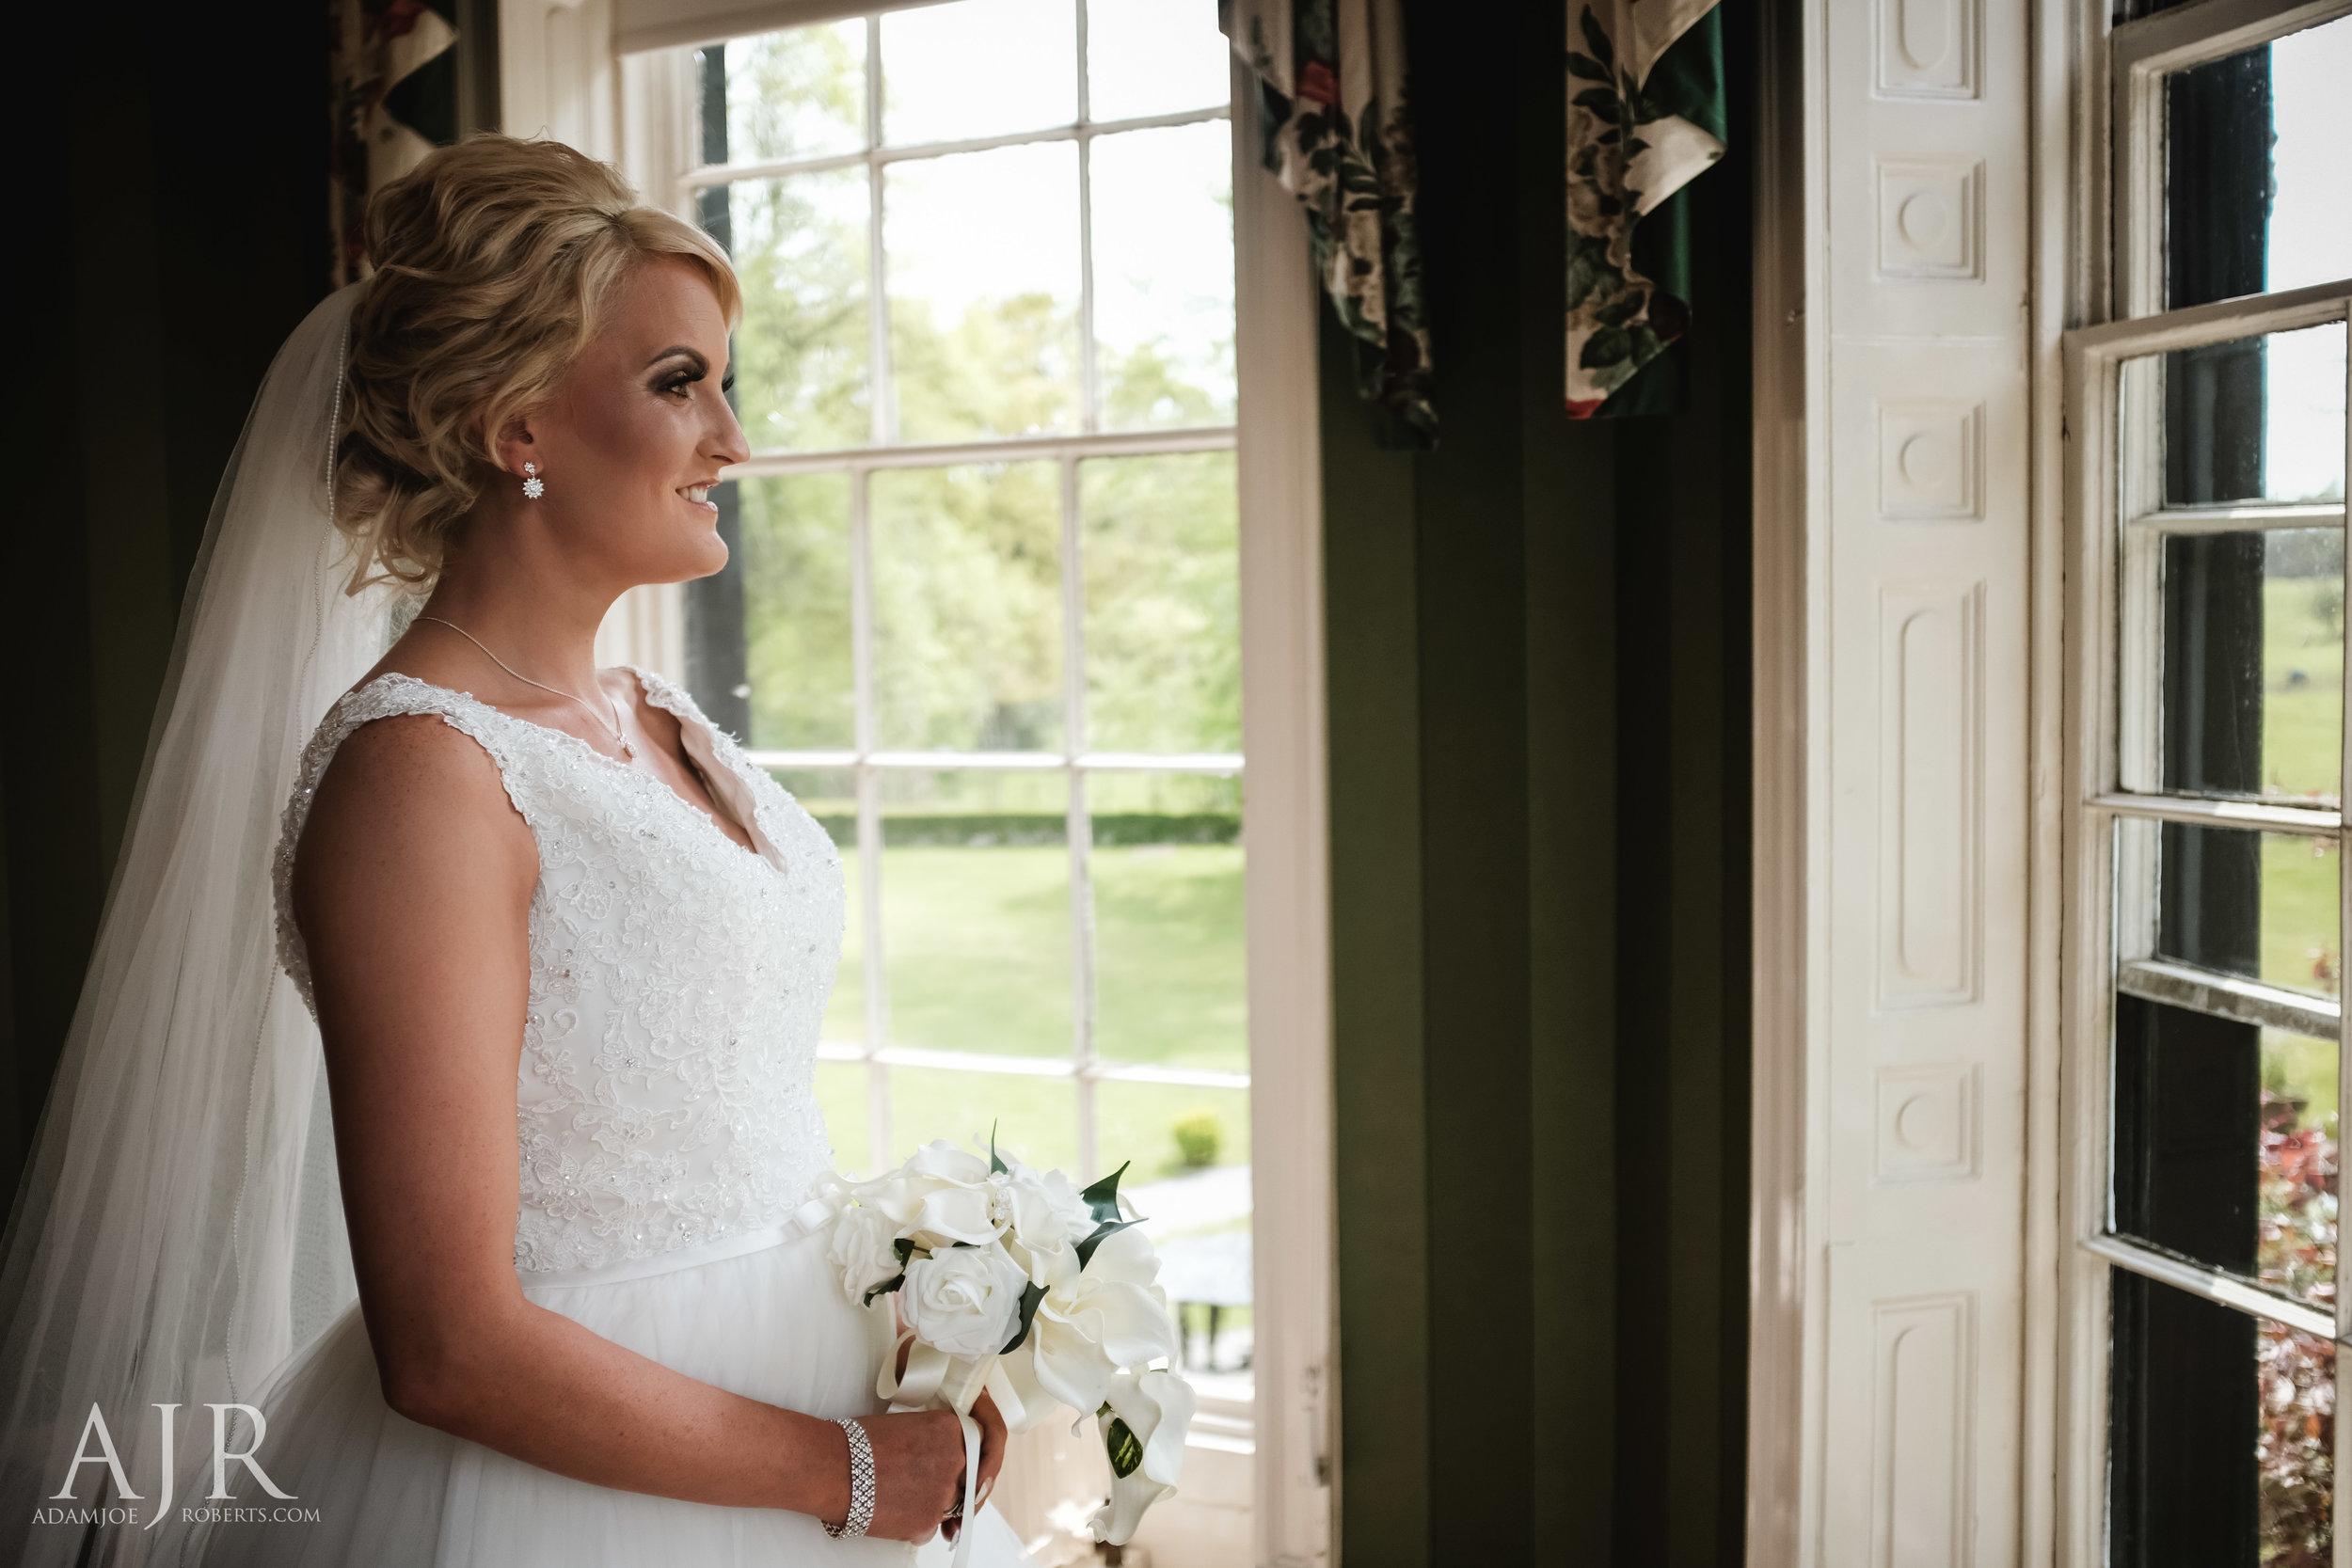 statham lodge wedding photographer cheshire wedding photographer (5 of 11).jpg